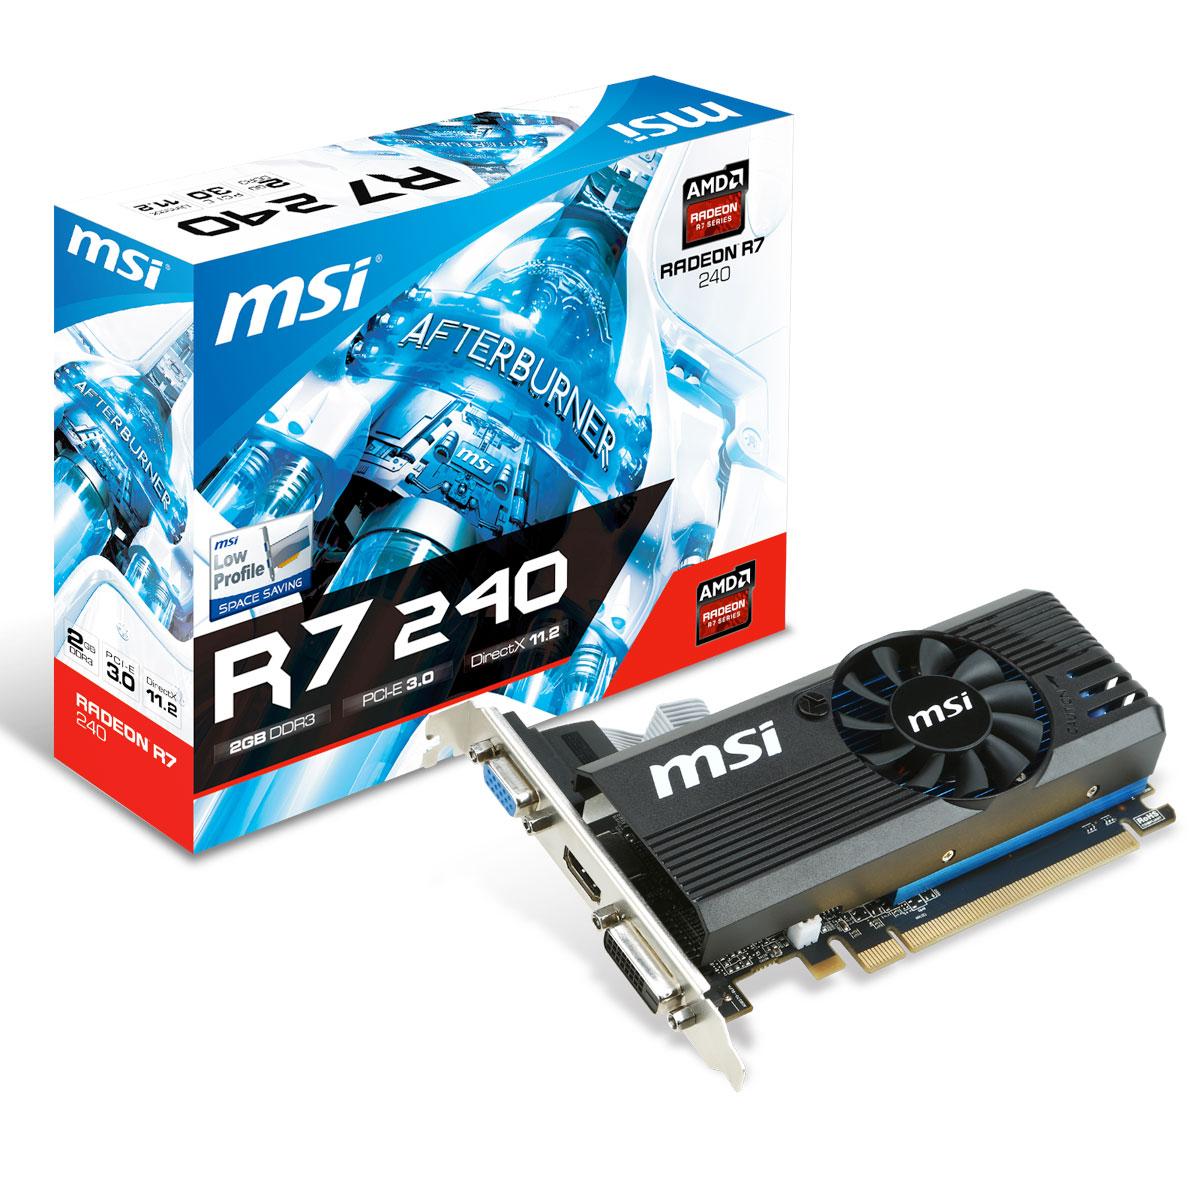 Carte graphique MSI Radeon R7 240 2GD3 LP 2 Go HDMI/DVI - PCI Express (AMD Radeon R7 240)